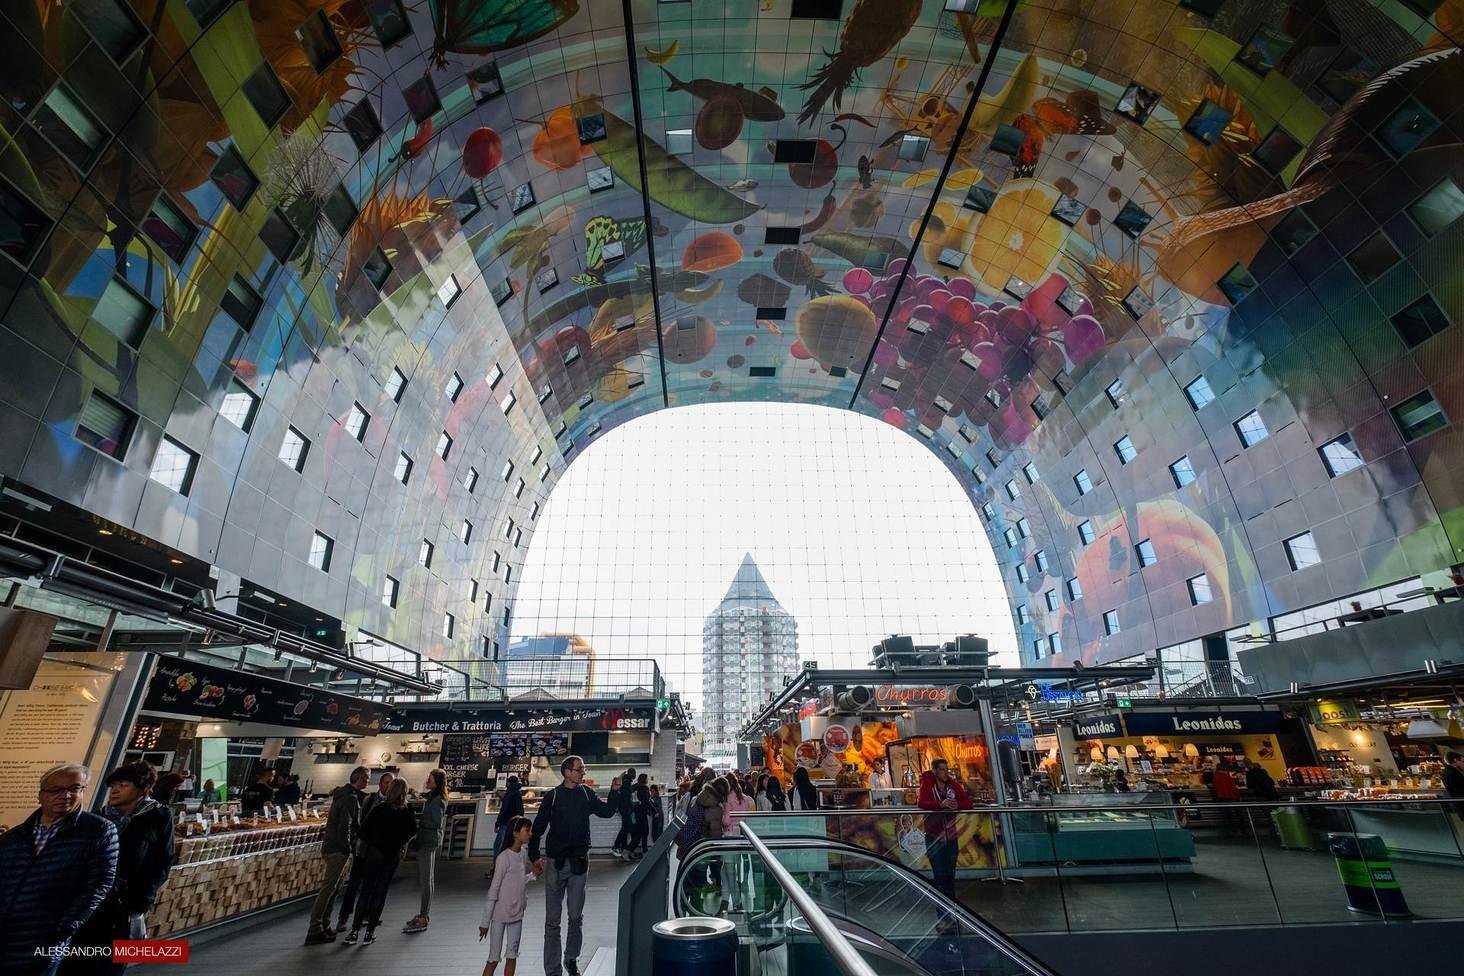 Rotterdam-Photography-Alessandro-Michelazzi-2